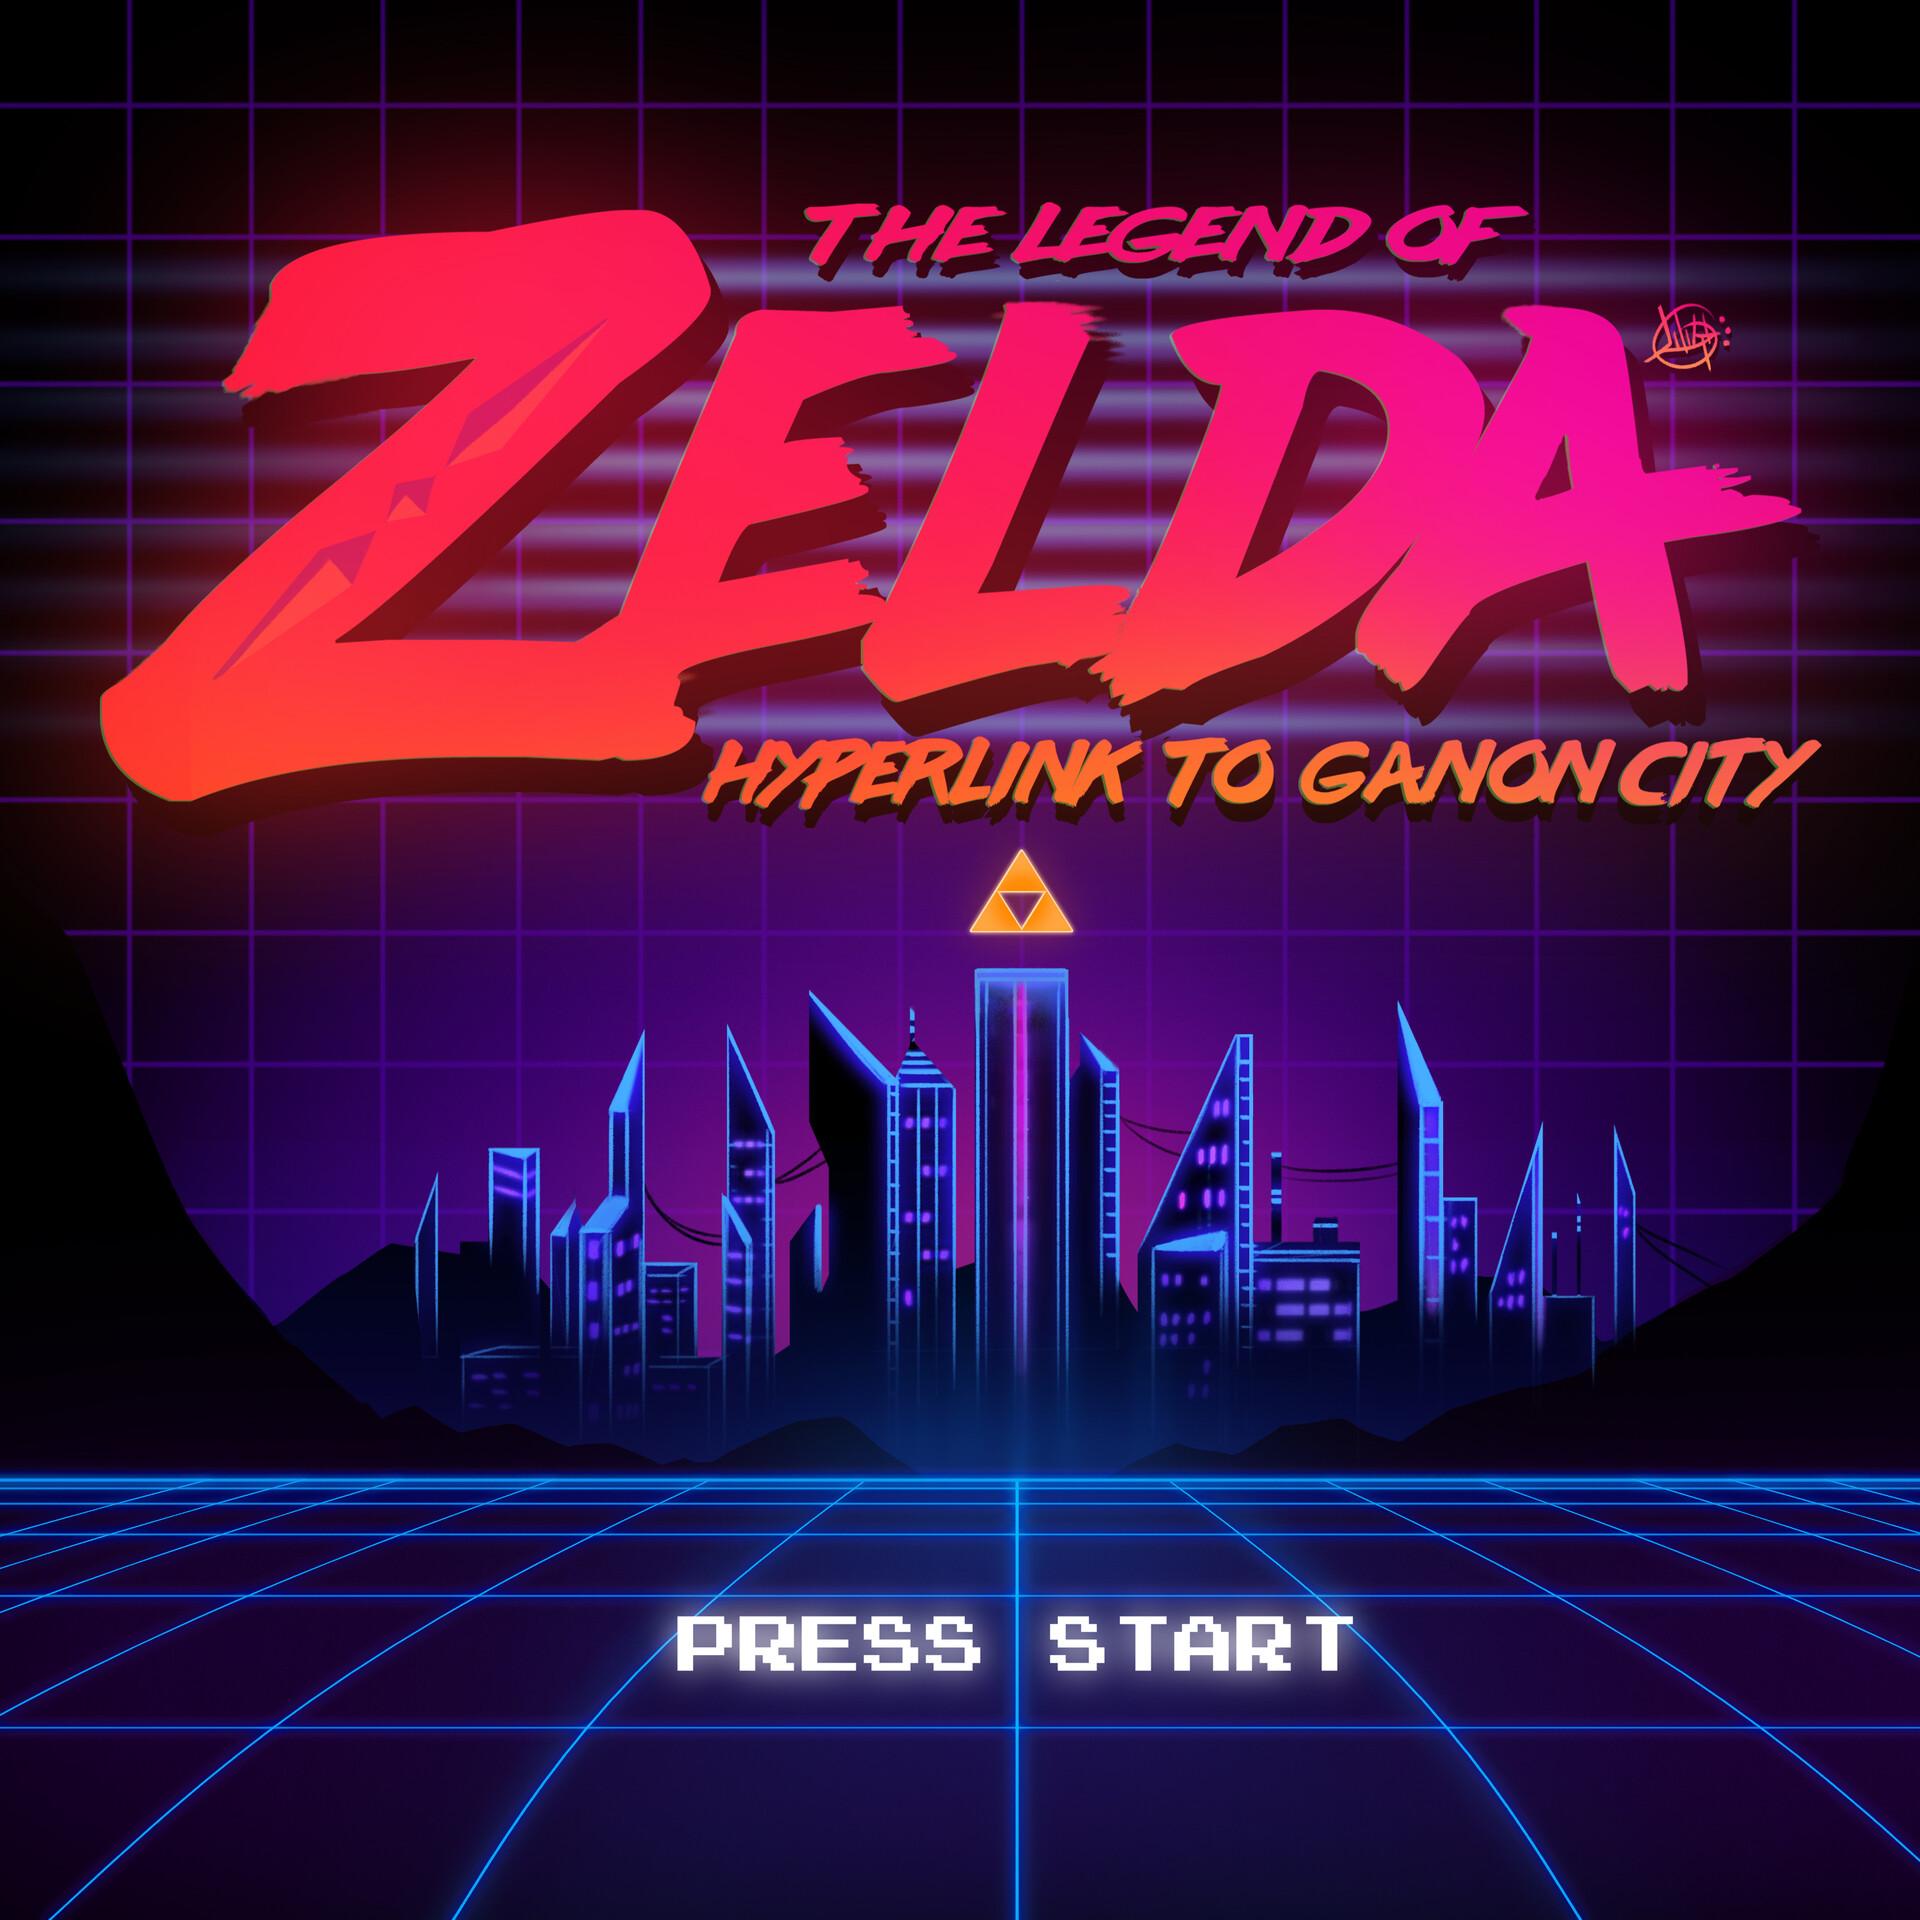 Luigi lucarelli logo animated